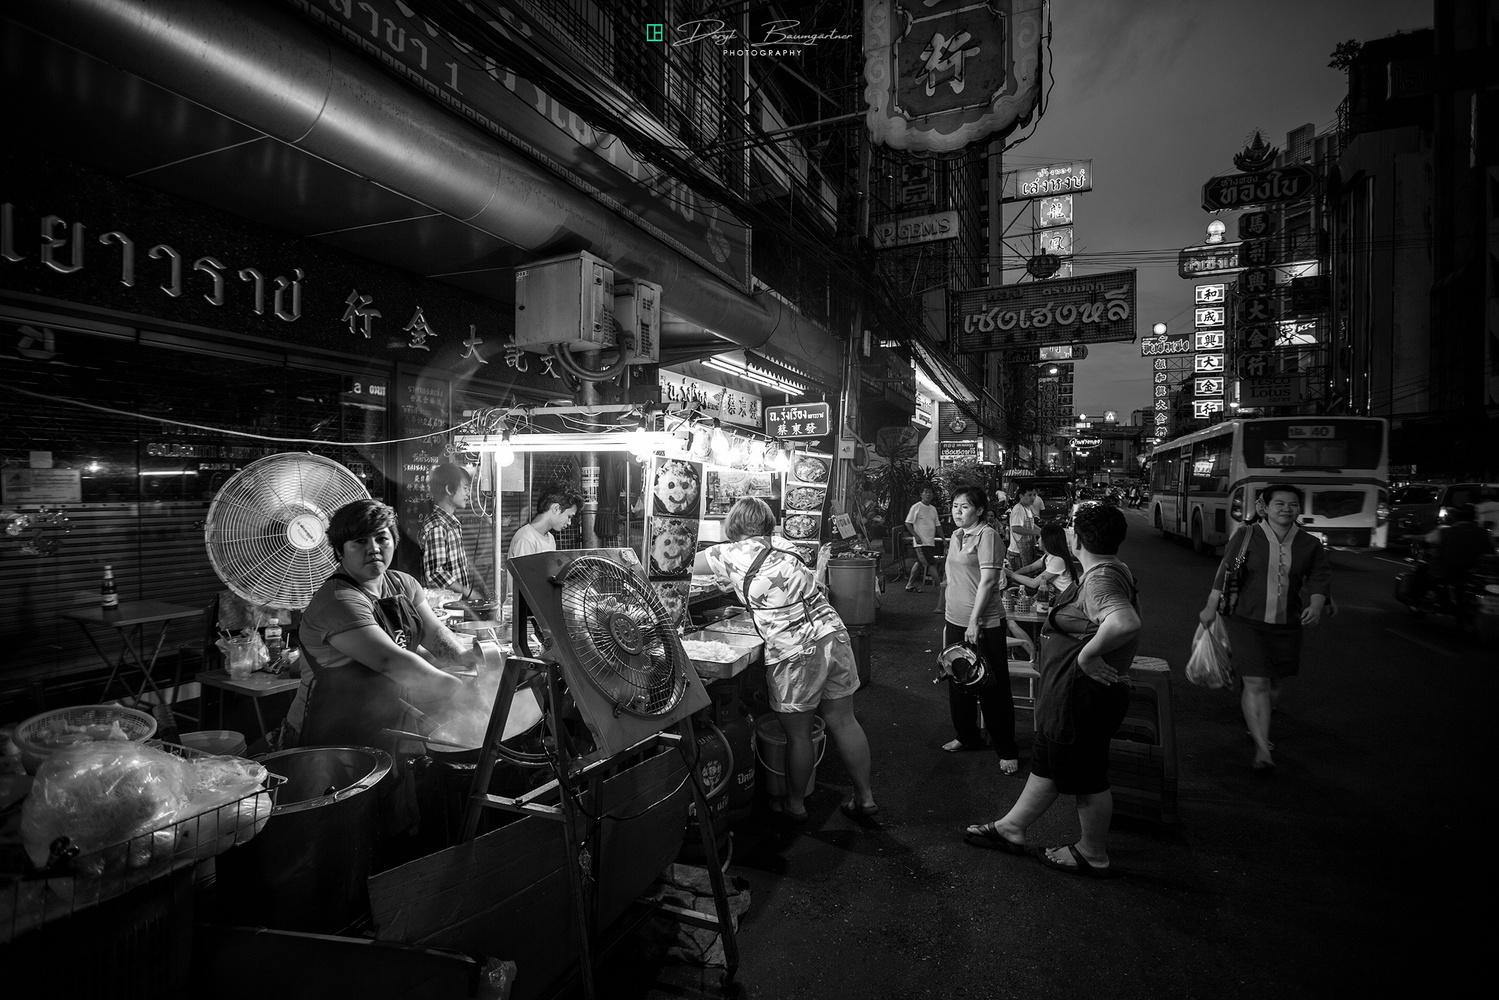 chinatown bangkok by Deryk Baumgärtner